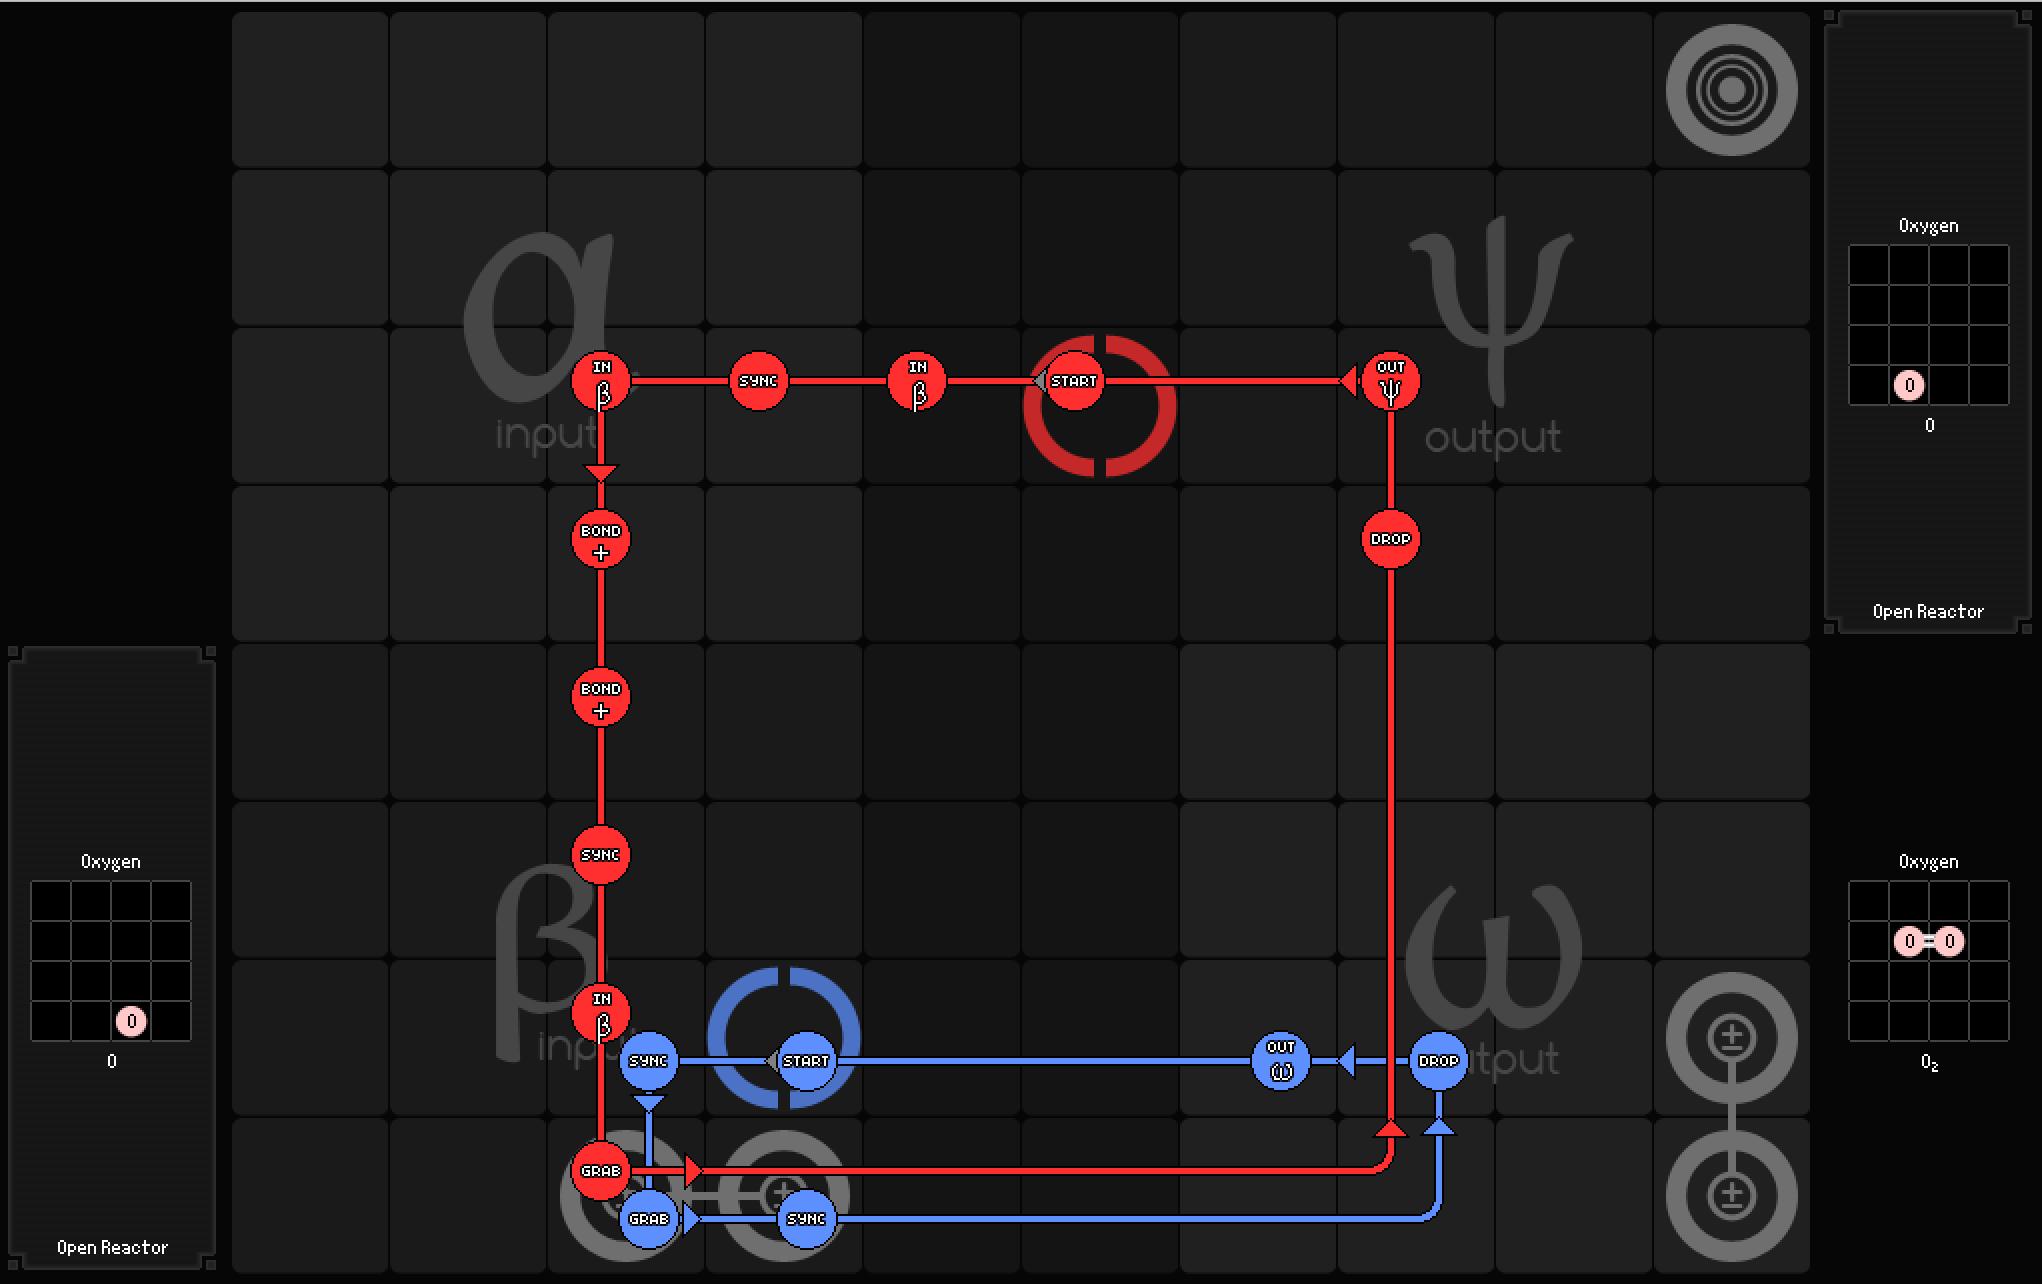 1_Story_Mode/5_Sikutar/SpaceChem-5.6.a-boss/Reactor_2.png